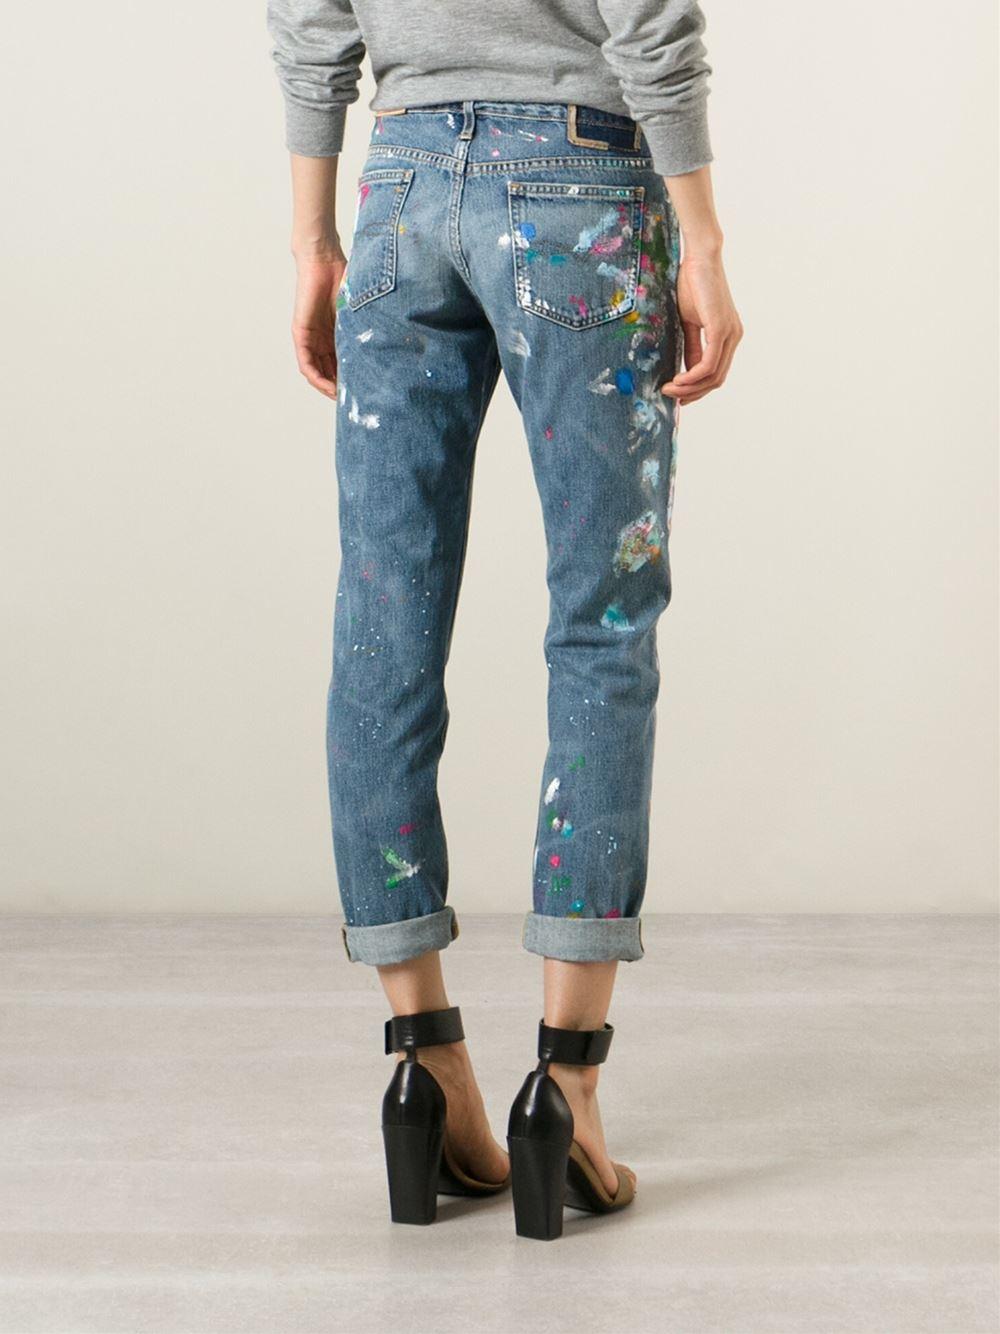 polo ralph lauren distressed paint splatter jeans in blue. Black Bedroom Furniture Sets. Home Design Ideas